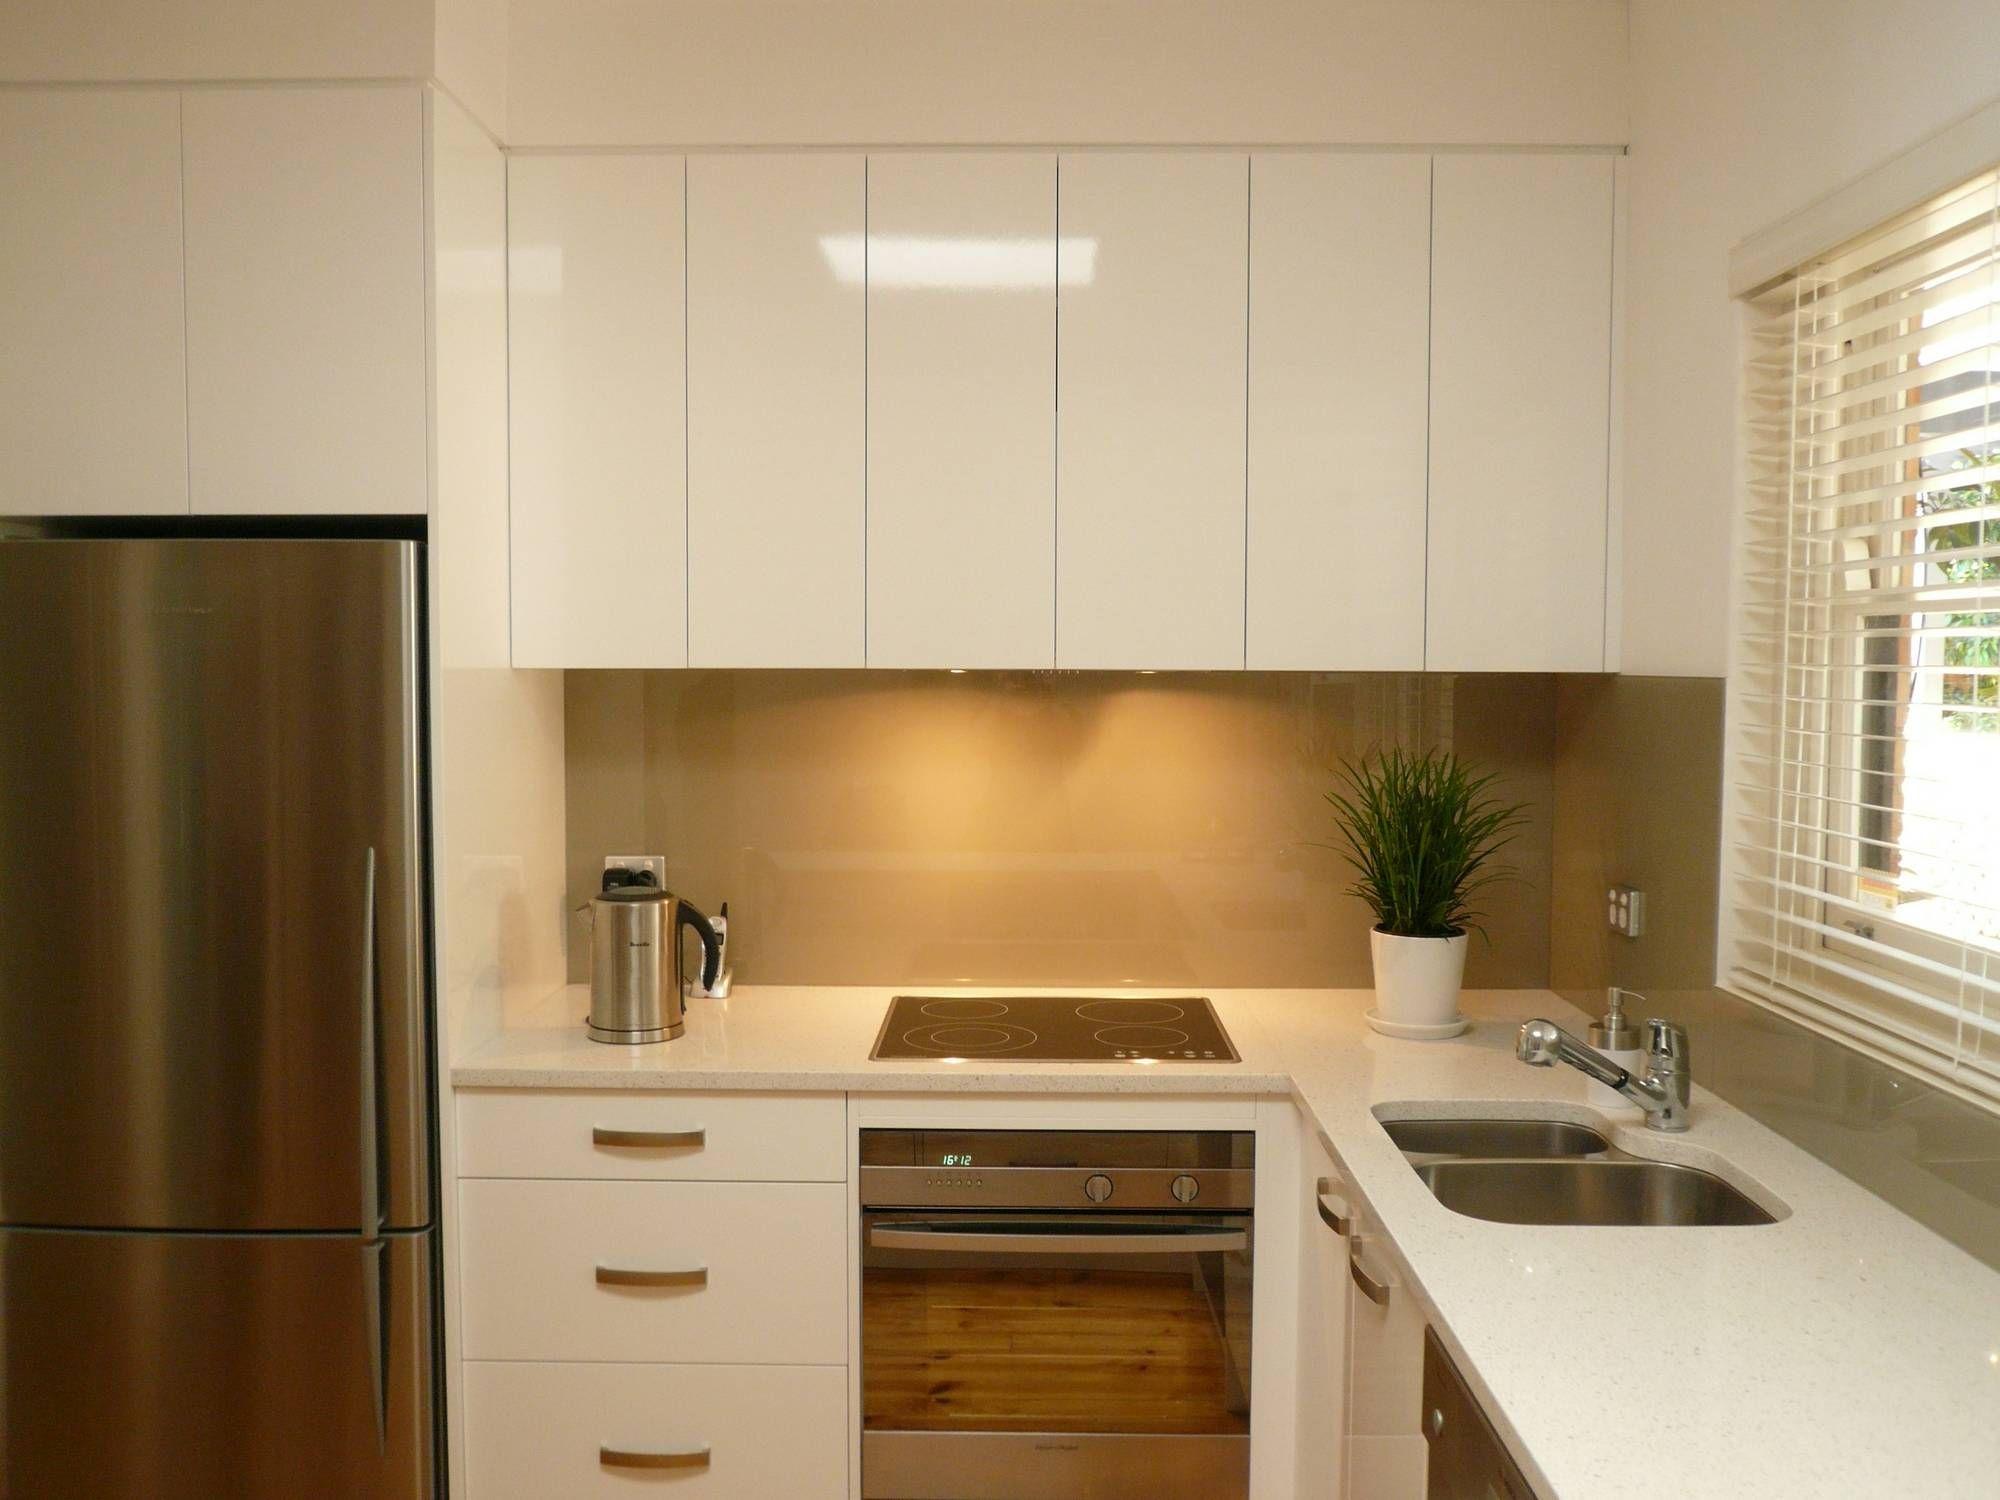 Black Splashback Kitchen 46 Best Ideas About Back Painted Glass On Pinterest Black